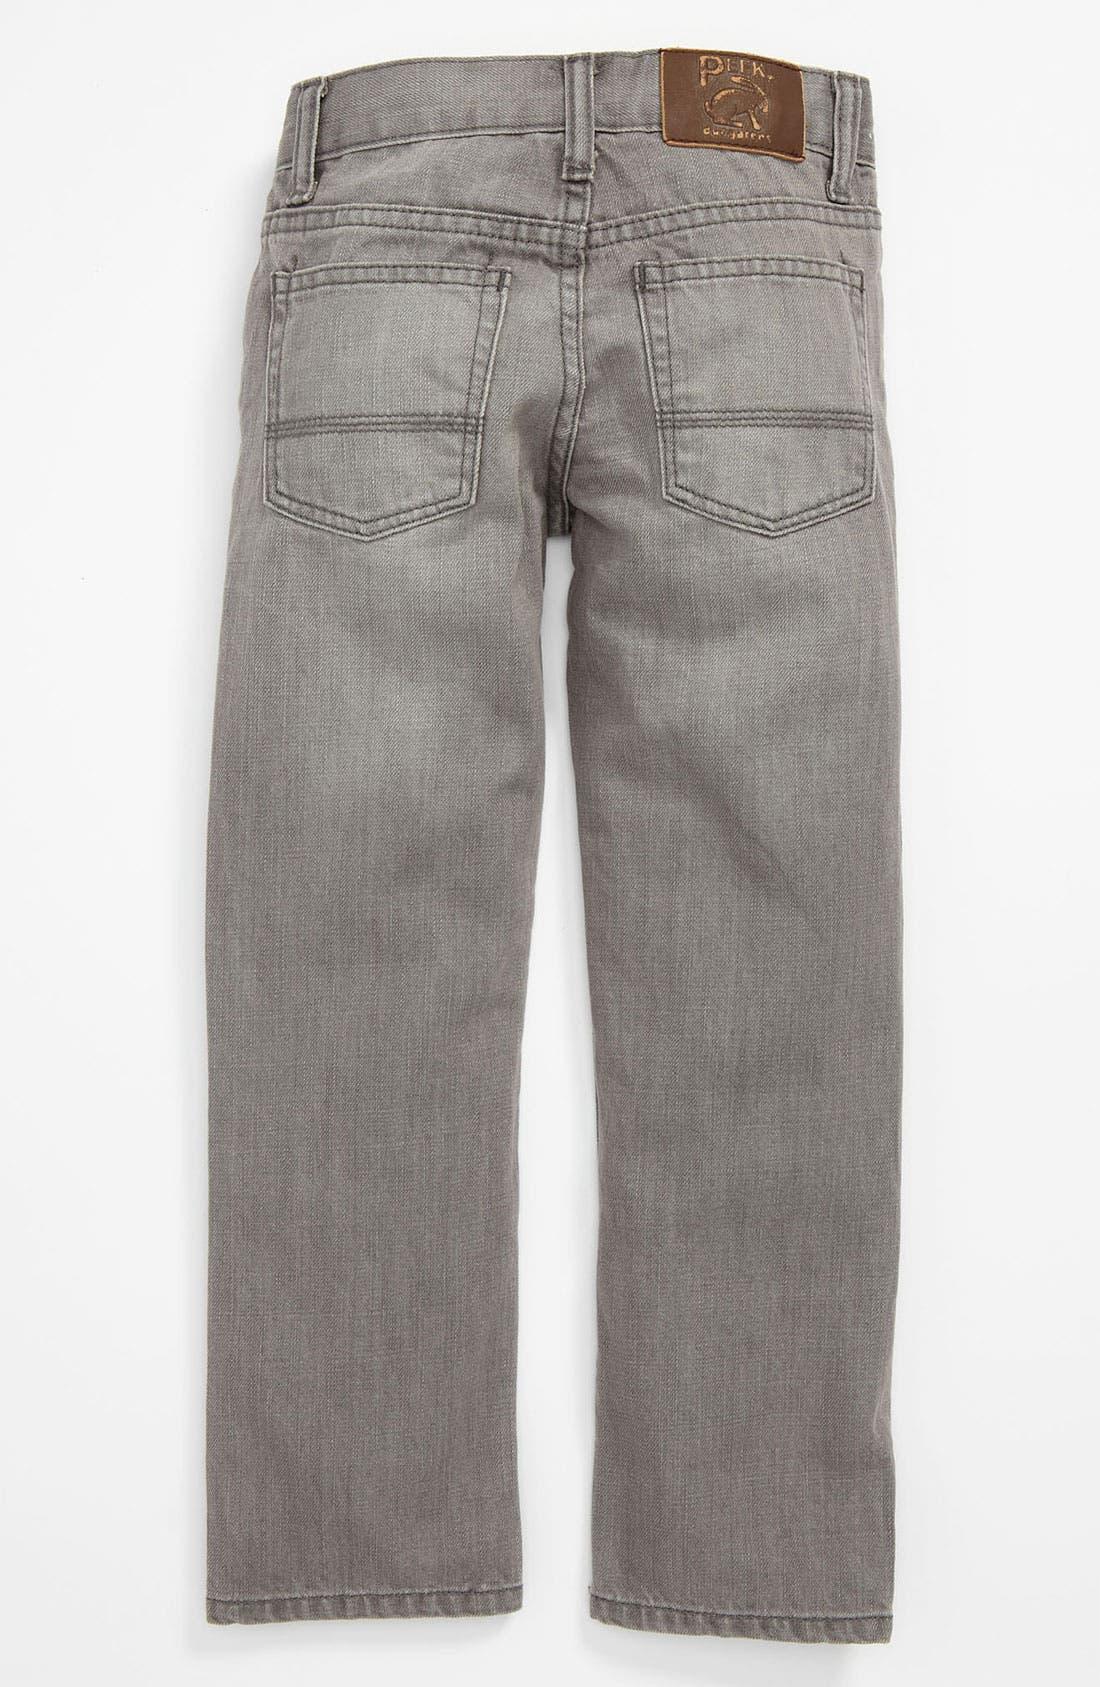 Alternate Image 1 Selected - Peek 'Ellis' Jeans (Toddler, Little Boys & Big Boys)